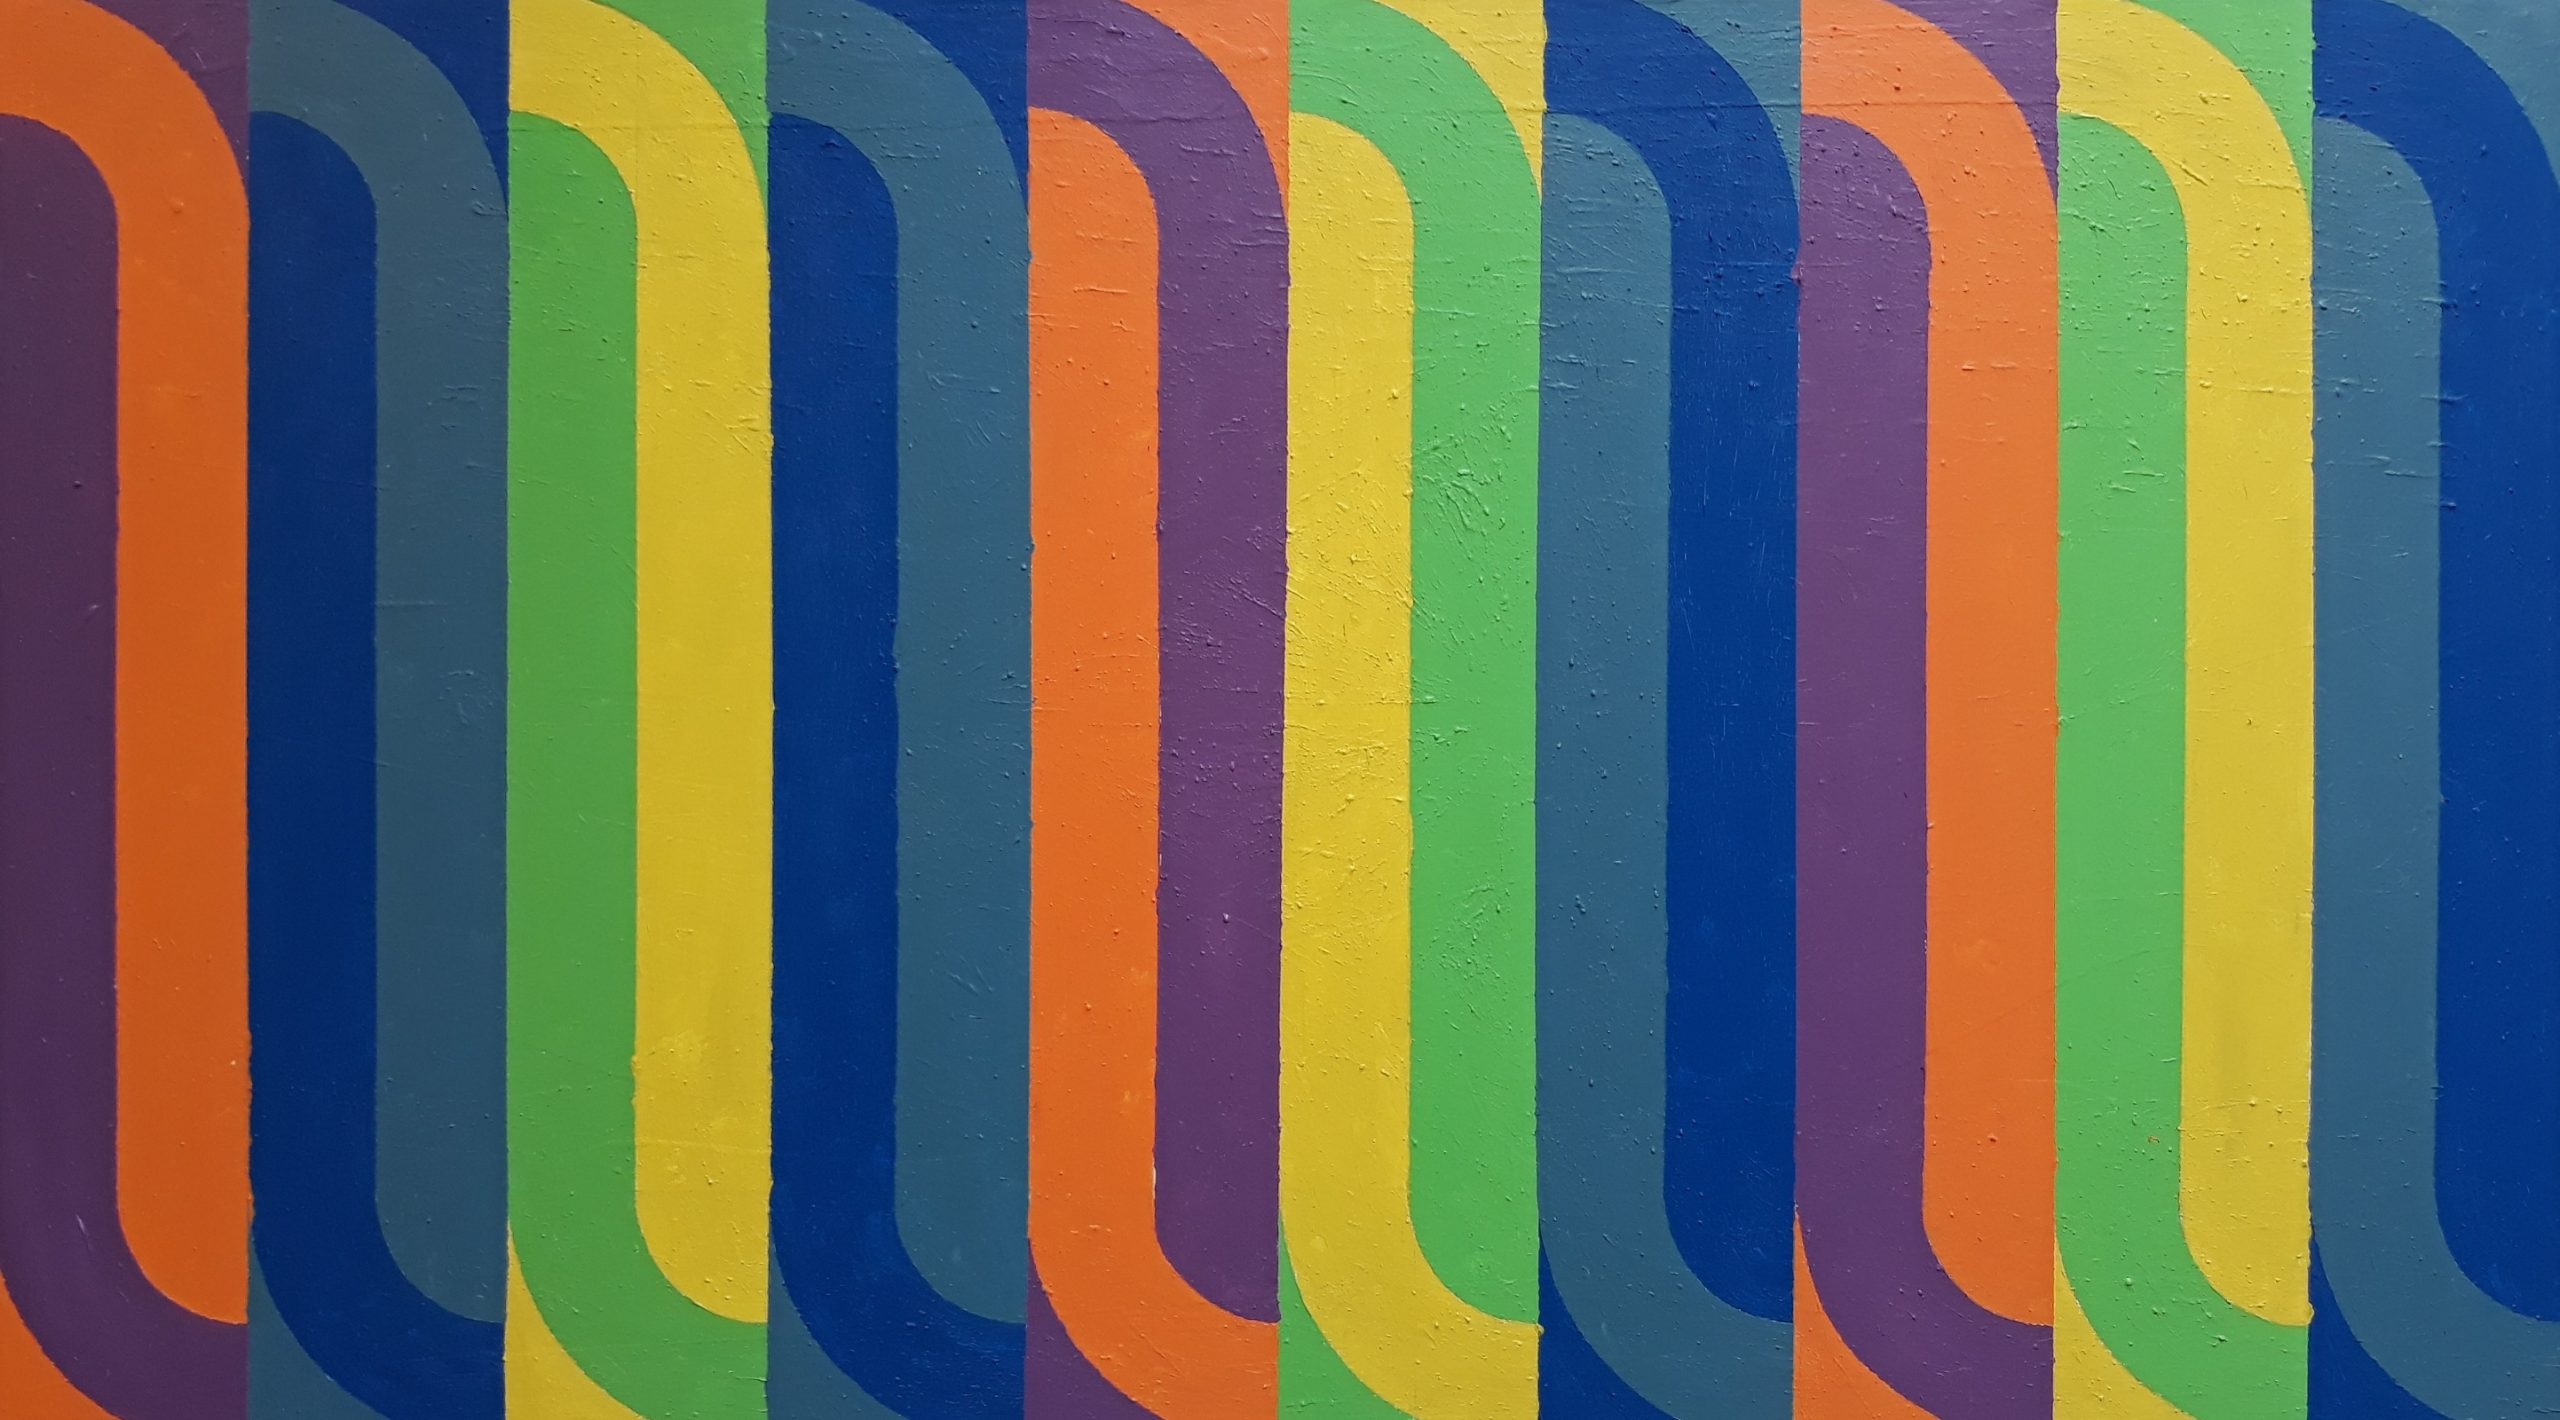 Radillon 2019 Acrylic on Canvas 86 x 153 cm